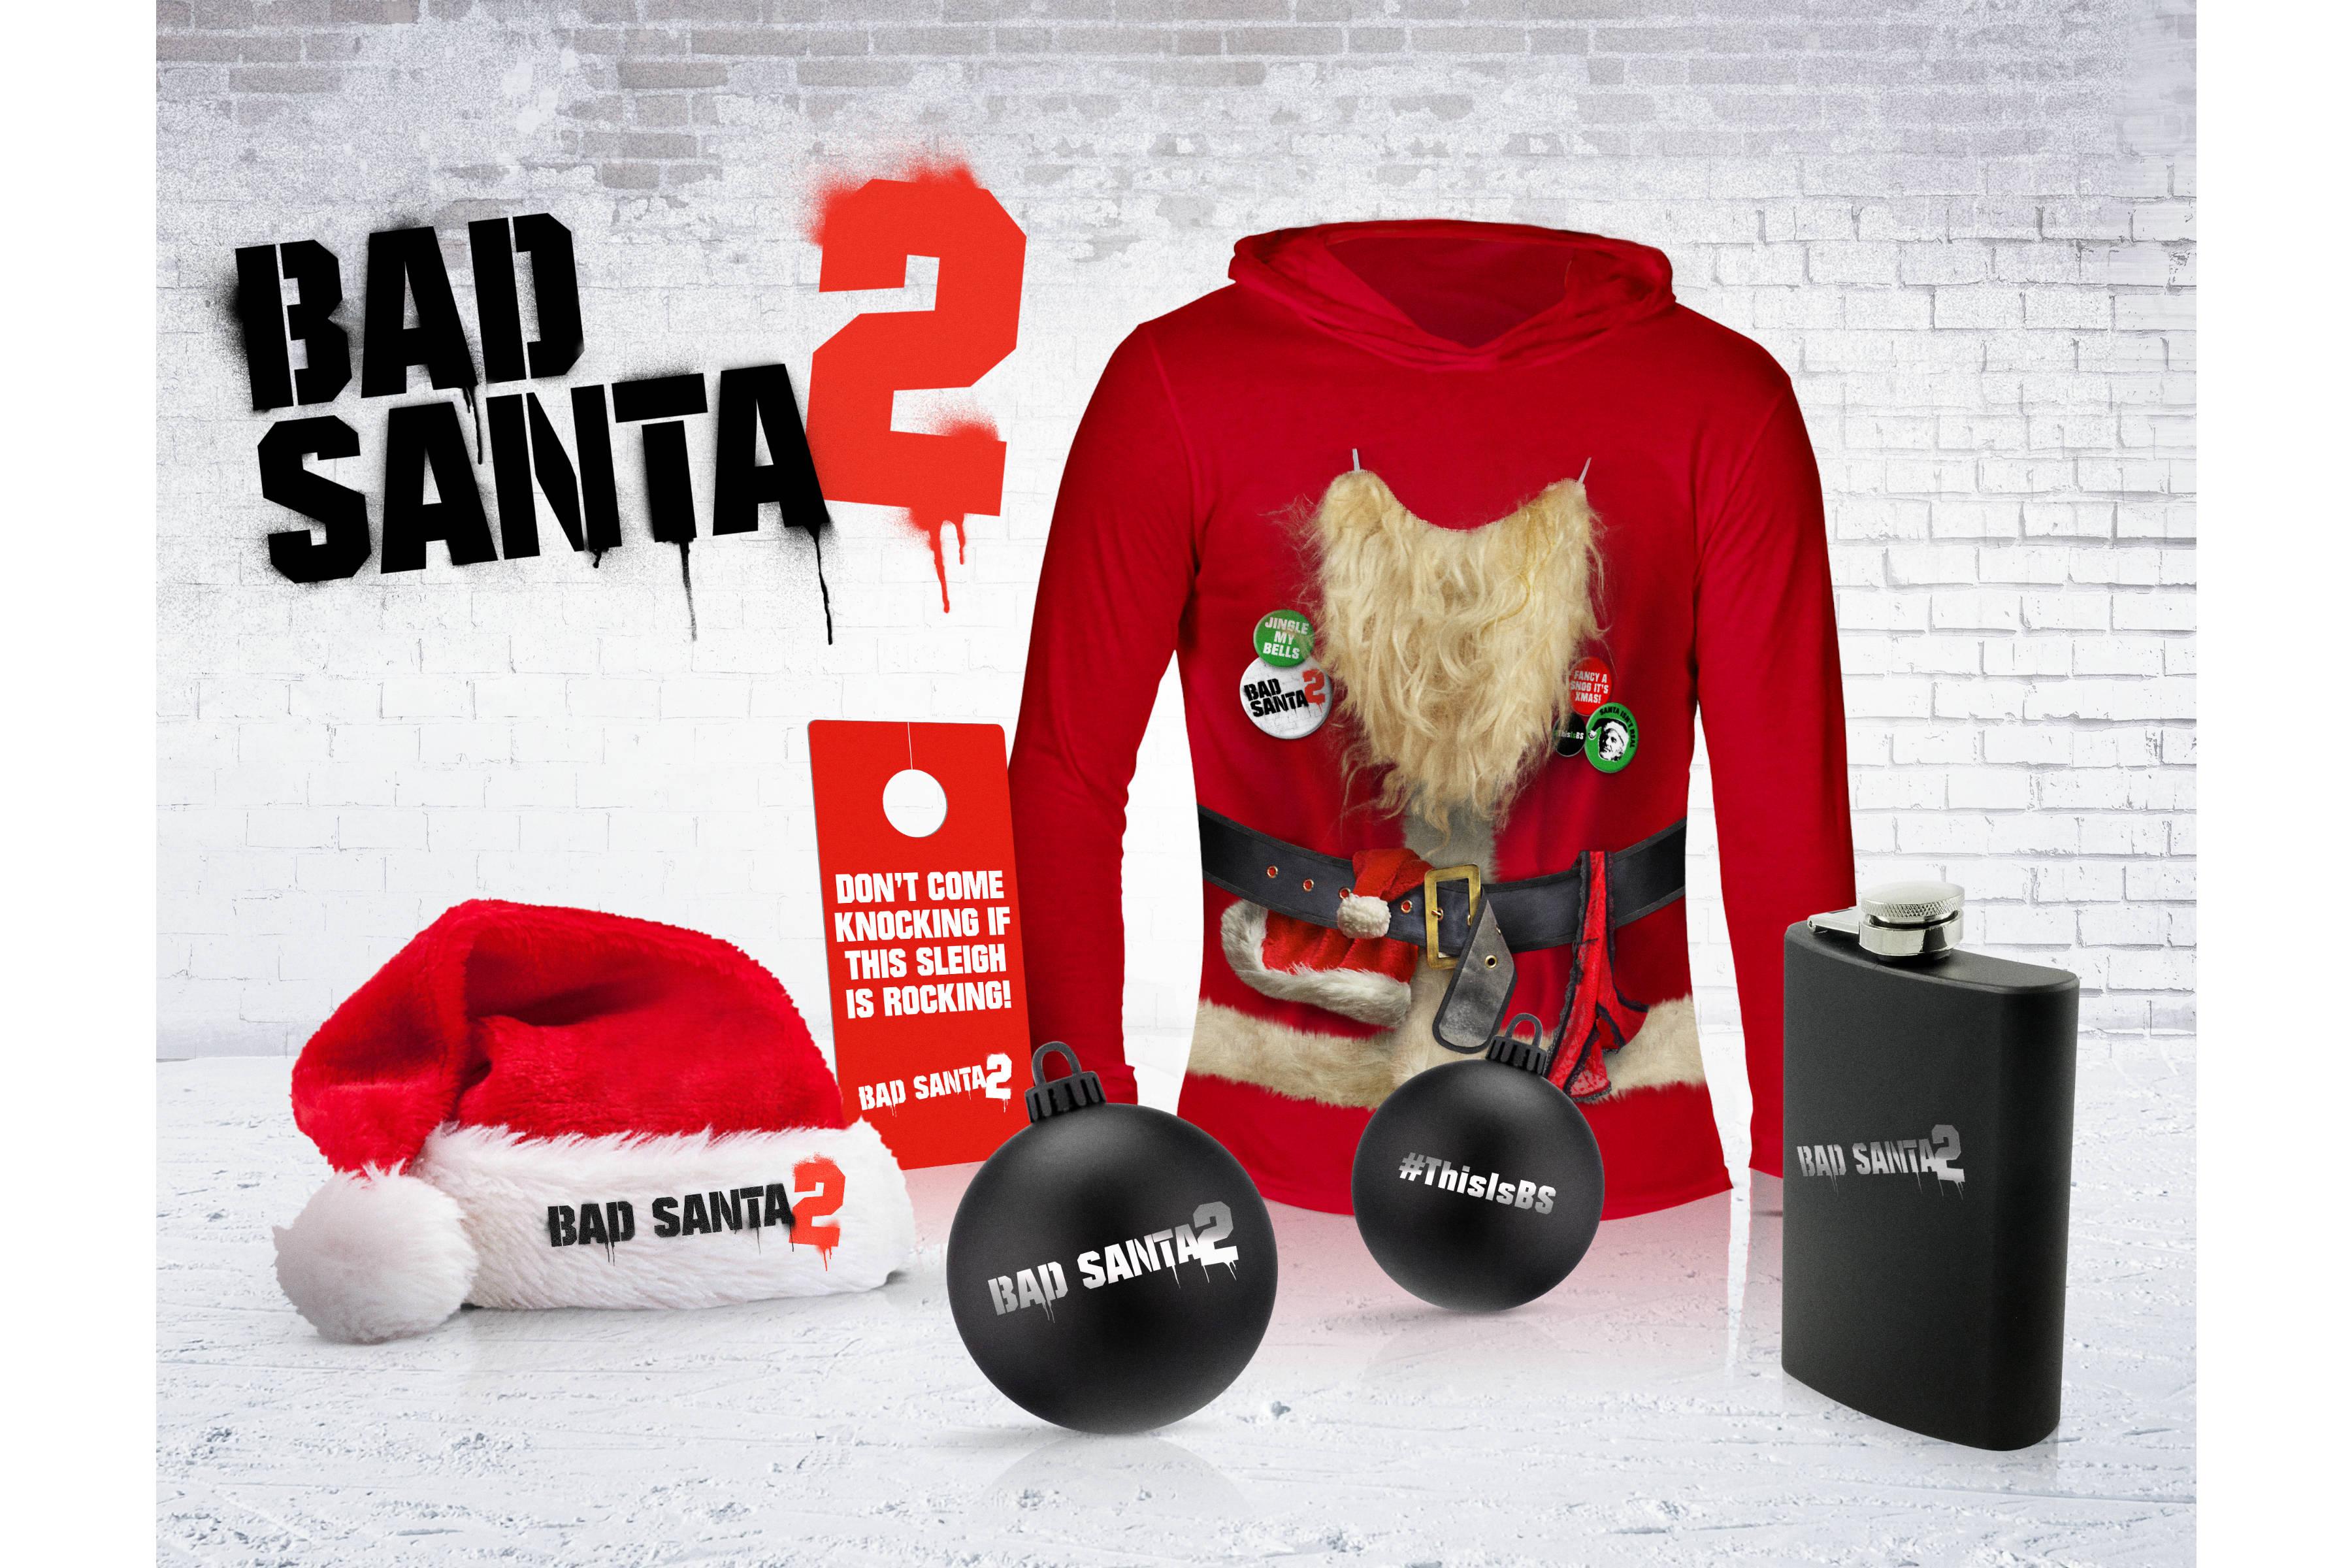 Bad Santa 2 Desktop wallpaper